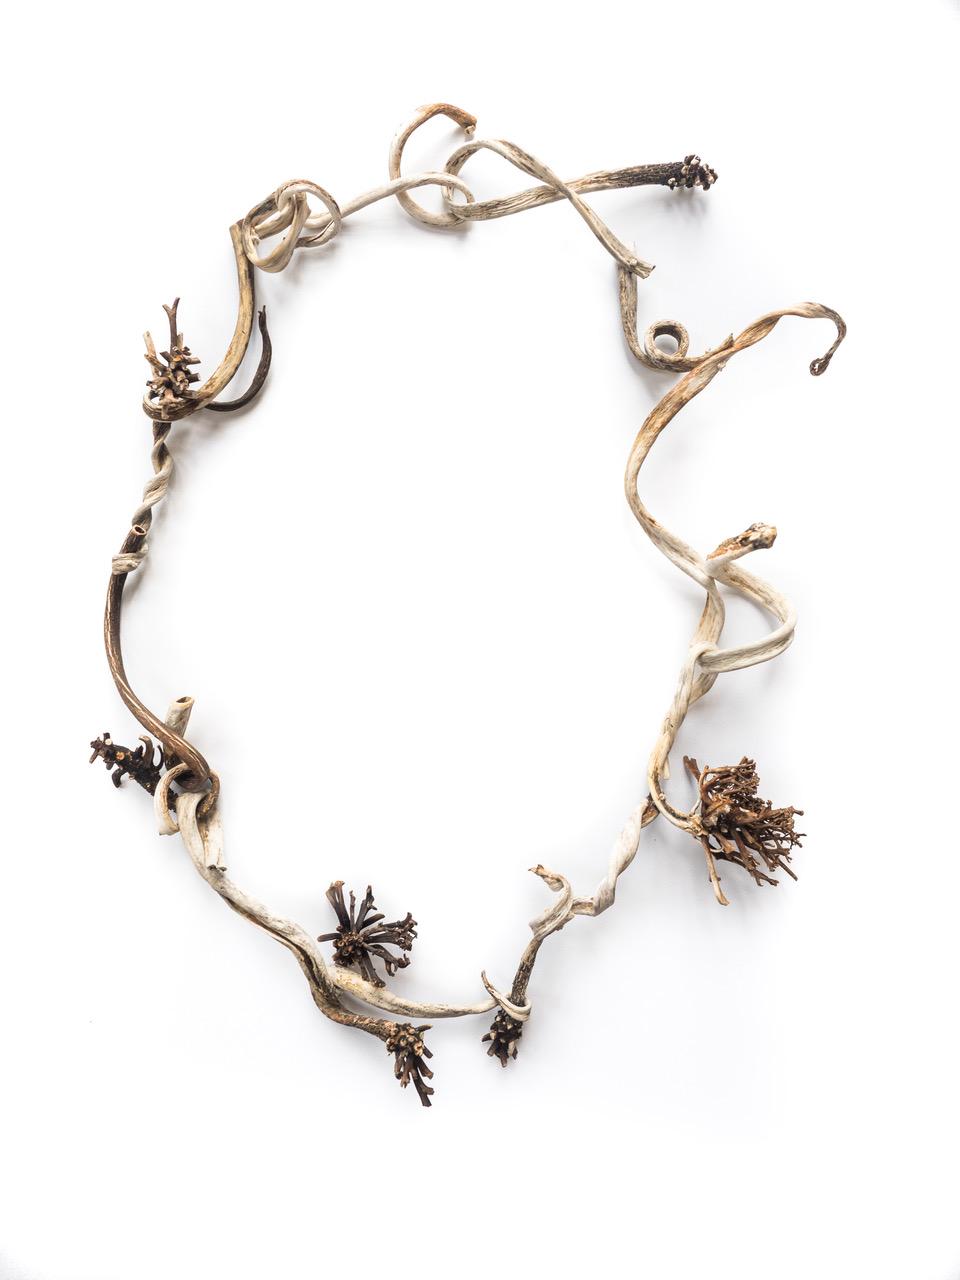 Nicky Hepburn,  Seaweed Lei  2017. Dried seaweed, hemp thread. Photo: Terry McConvill